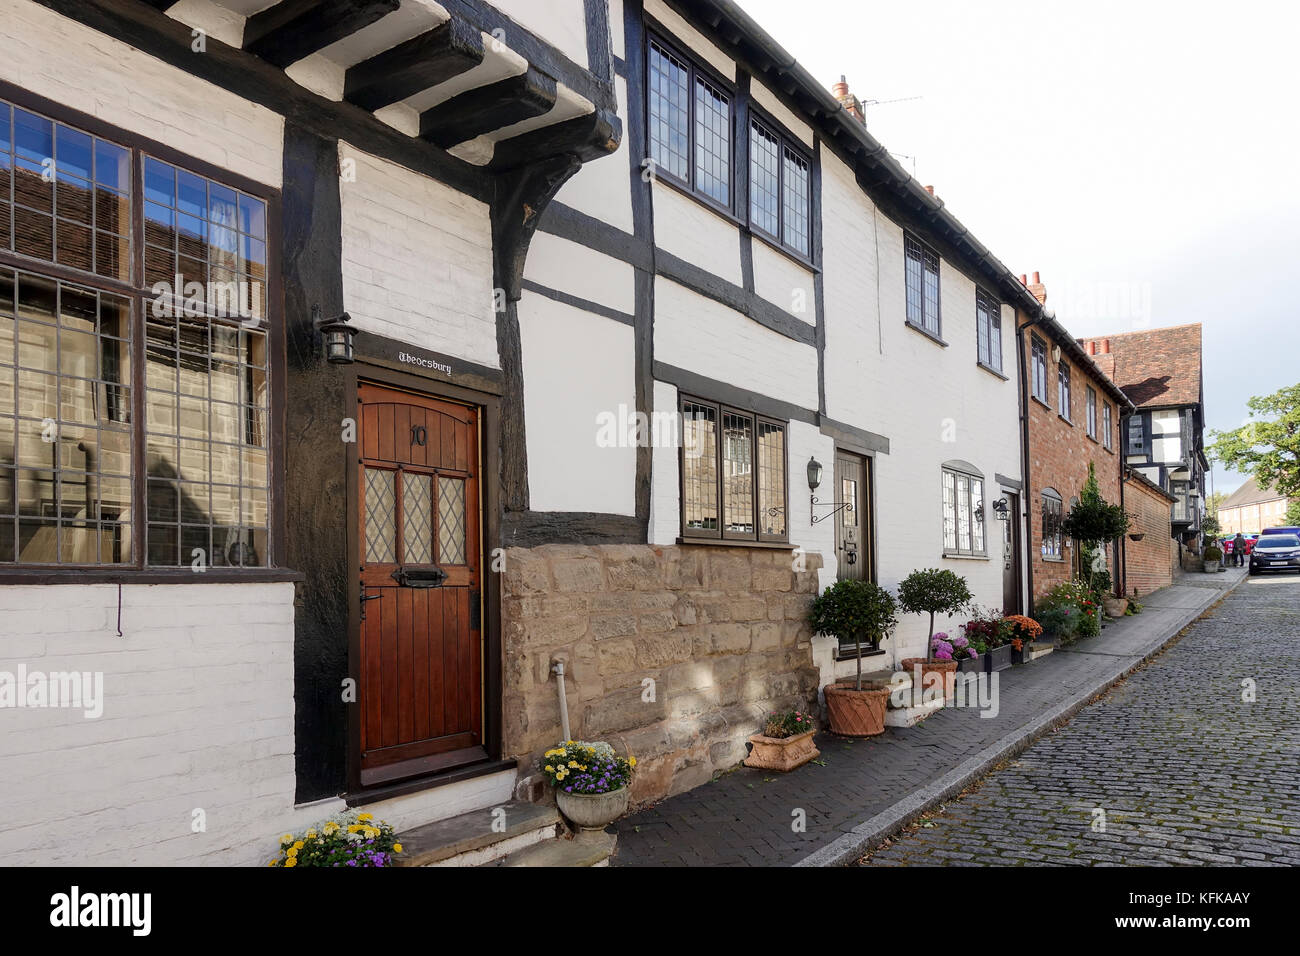 Mill Street, Warwick -1 - Stock Image